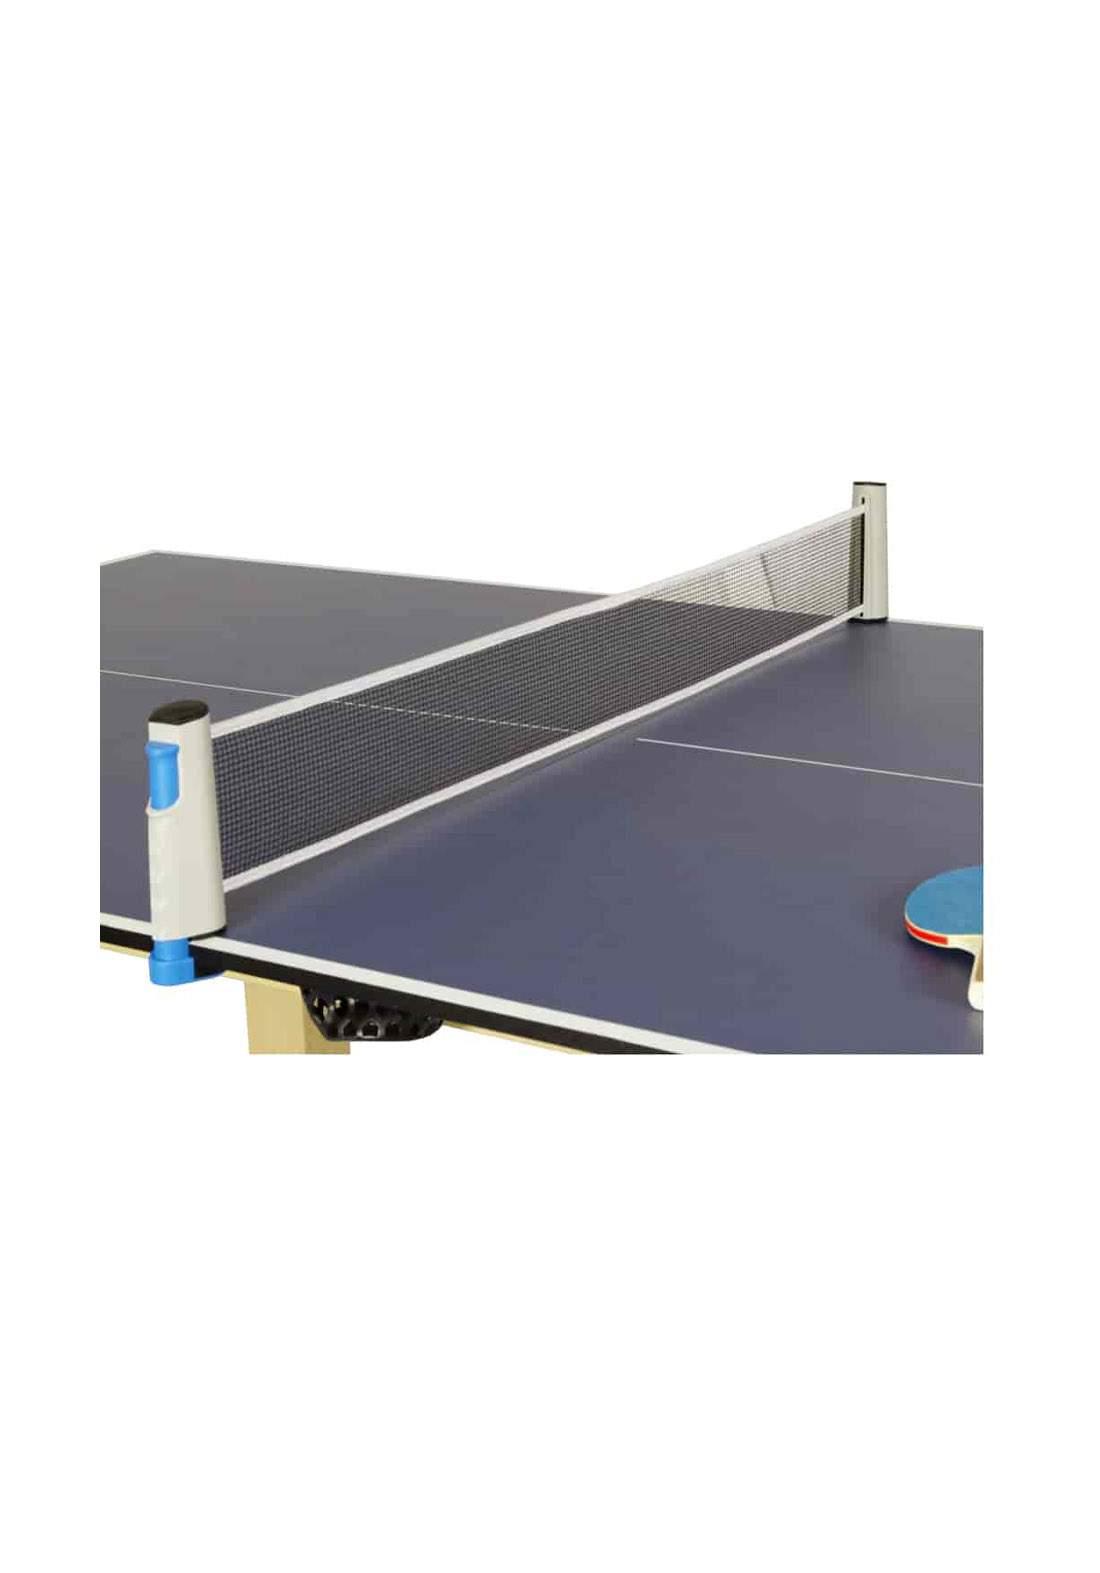 table tennis rack شبكة منضدة